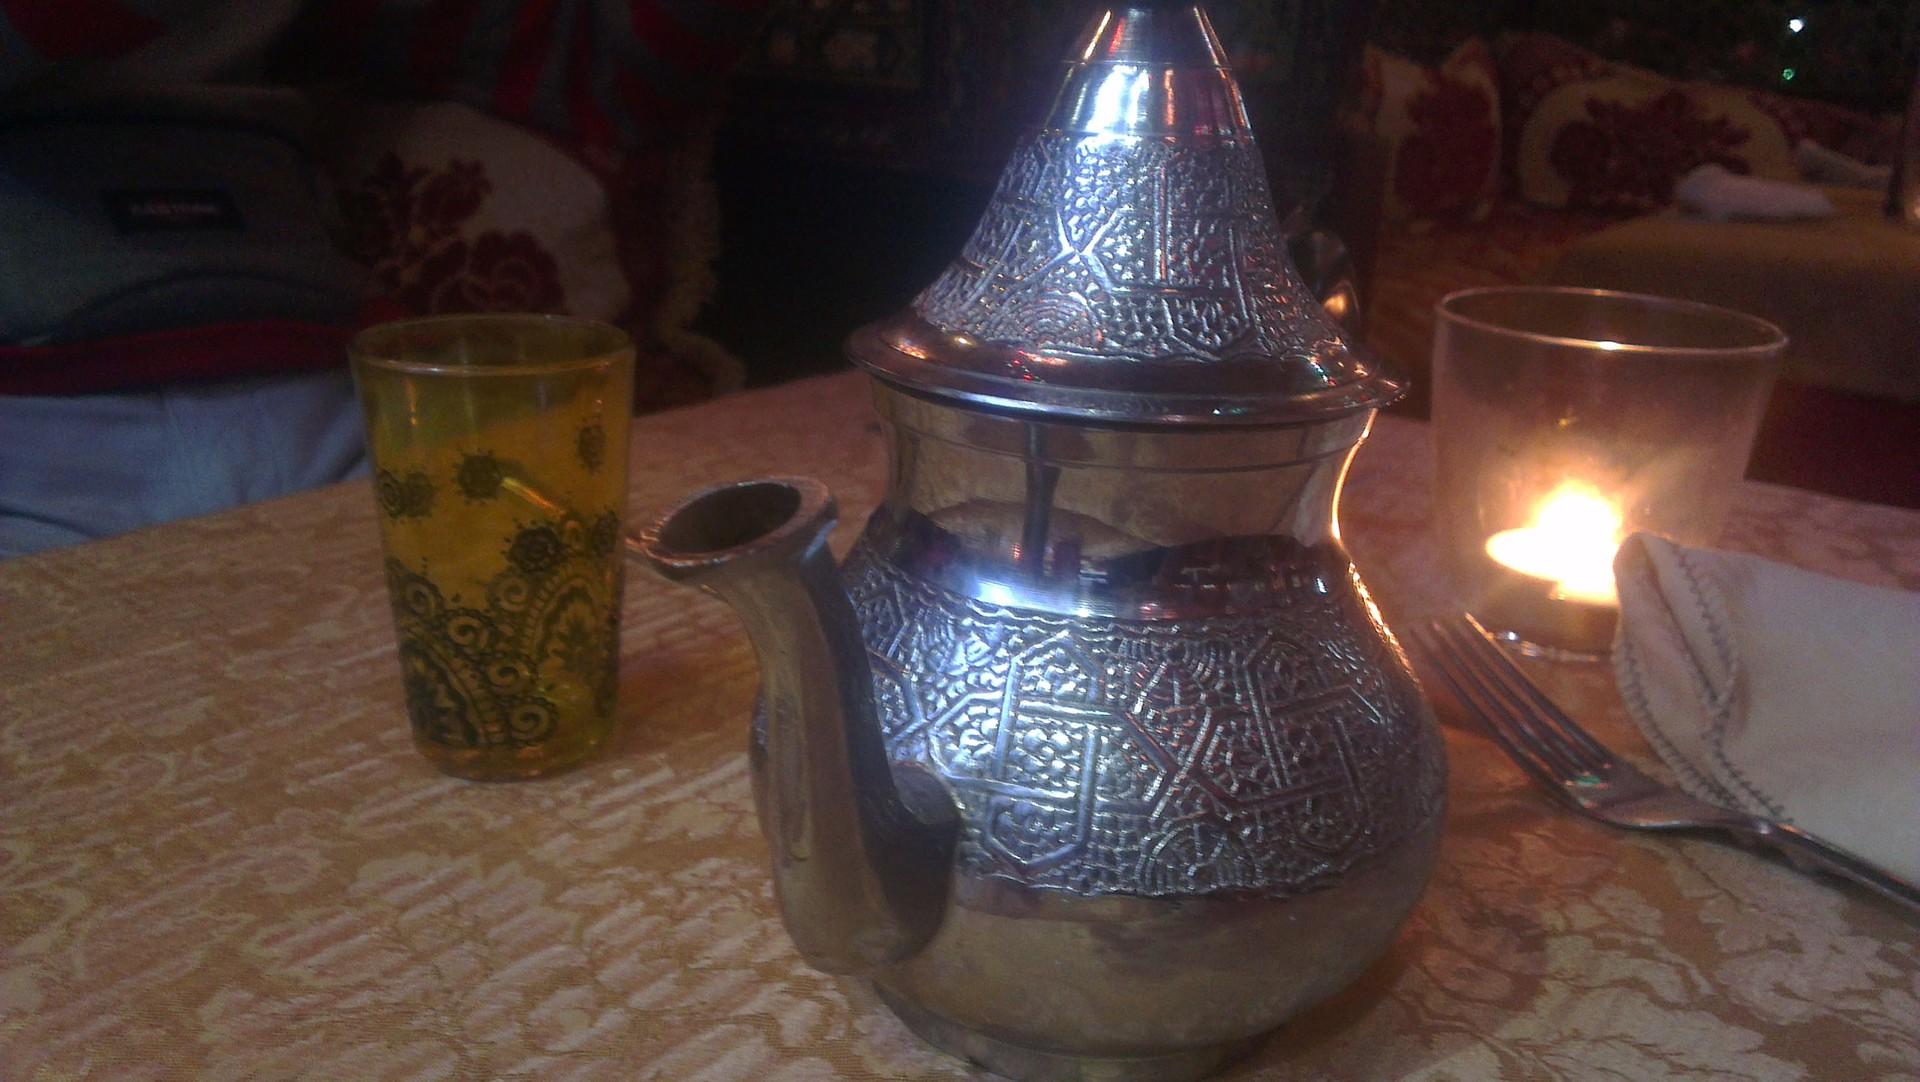 cuisine-marocaine-a-grenade-74b9e5ccb5c1